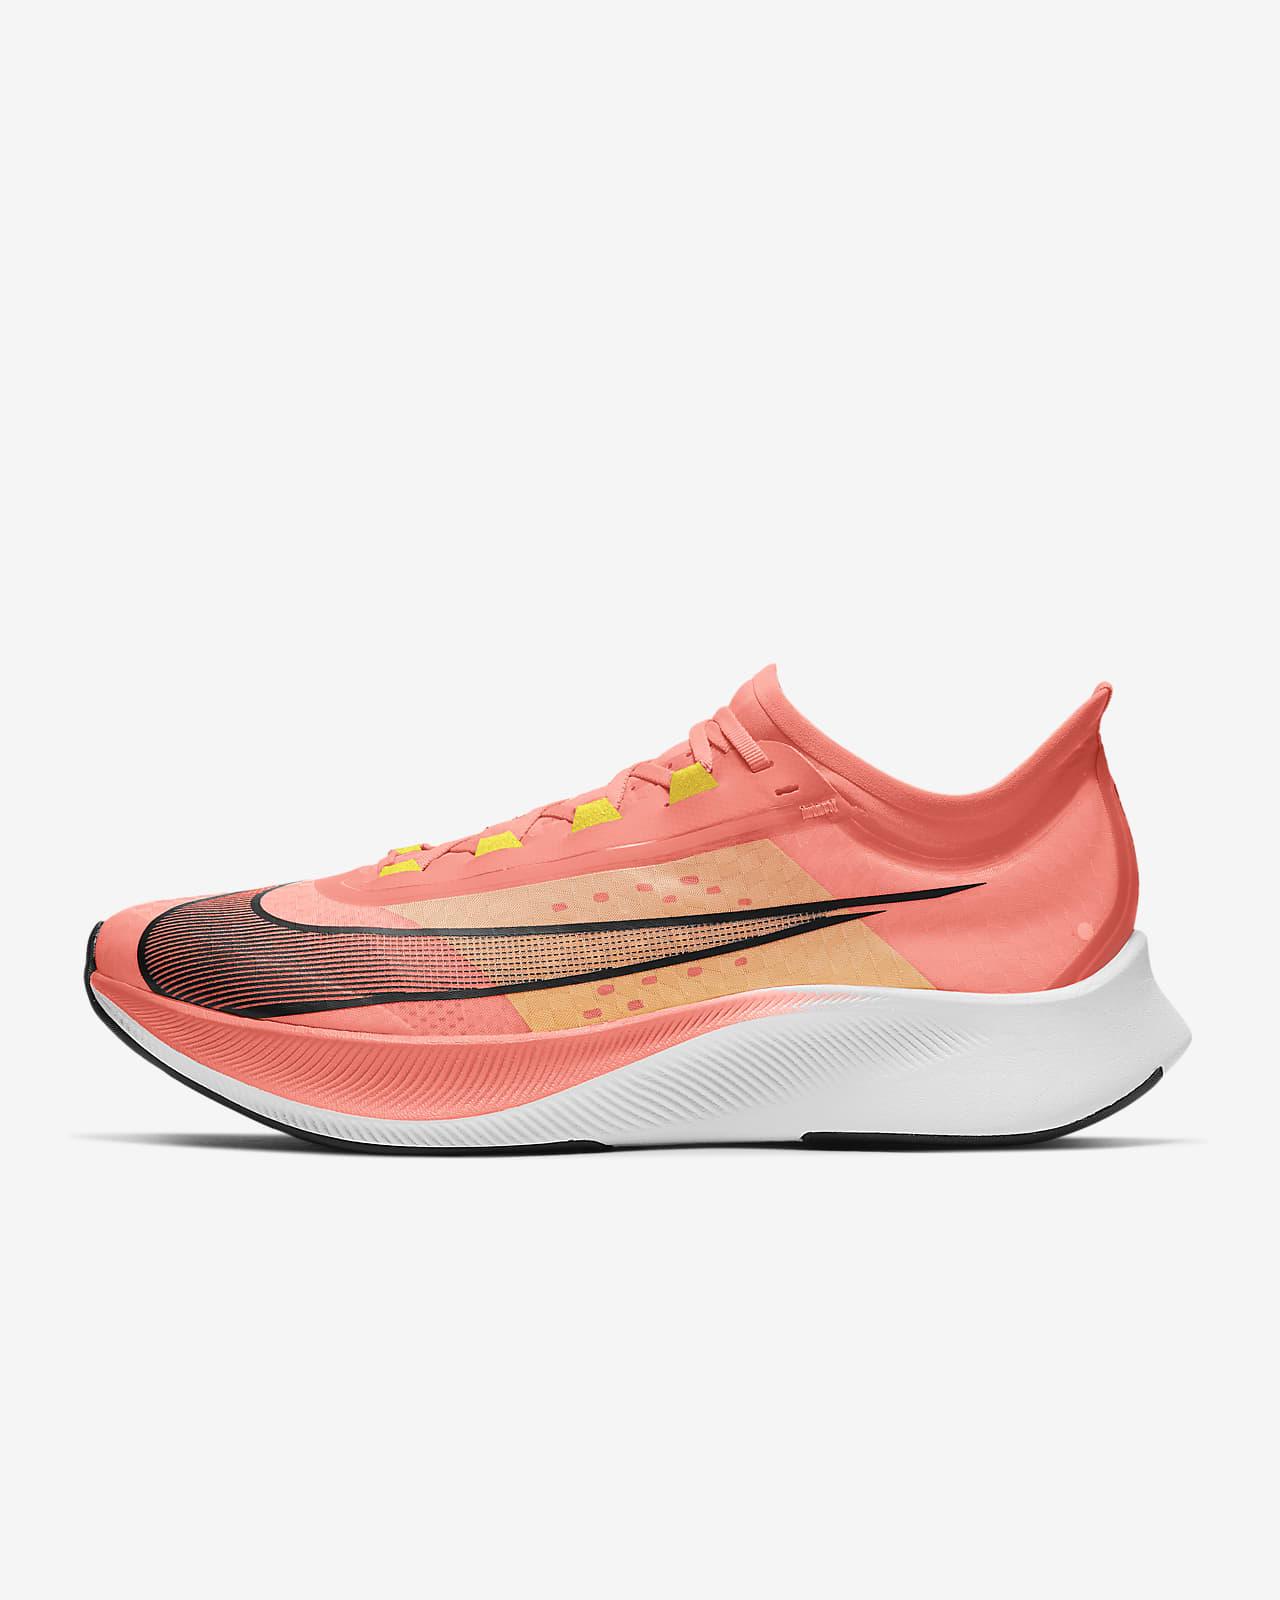 Nike Zoom Fly 3 男子跑步鞋